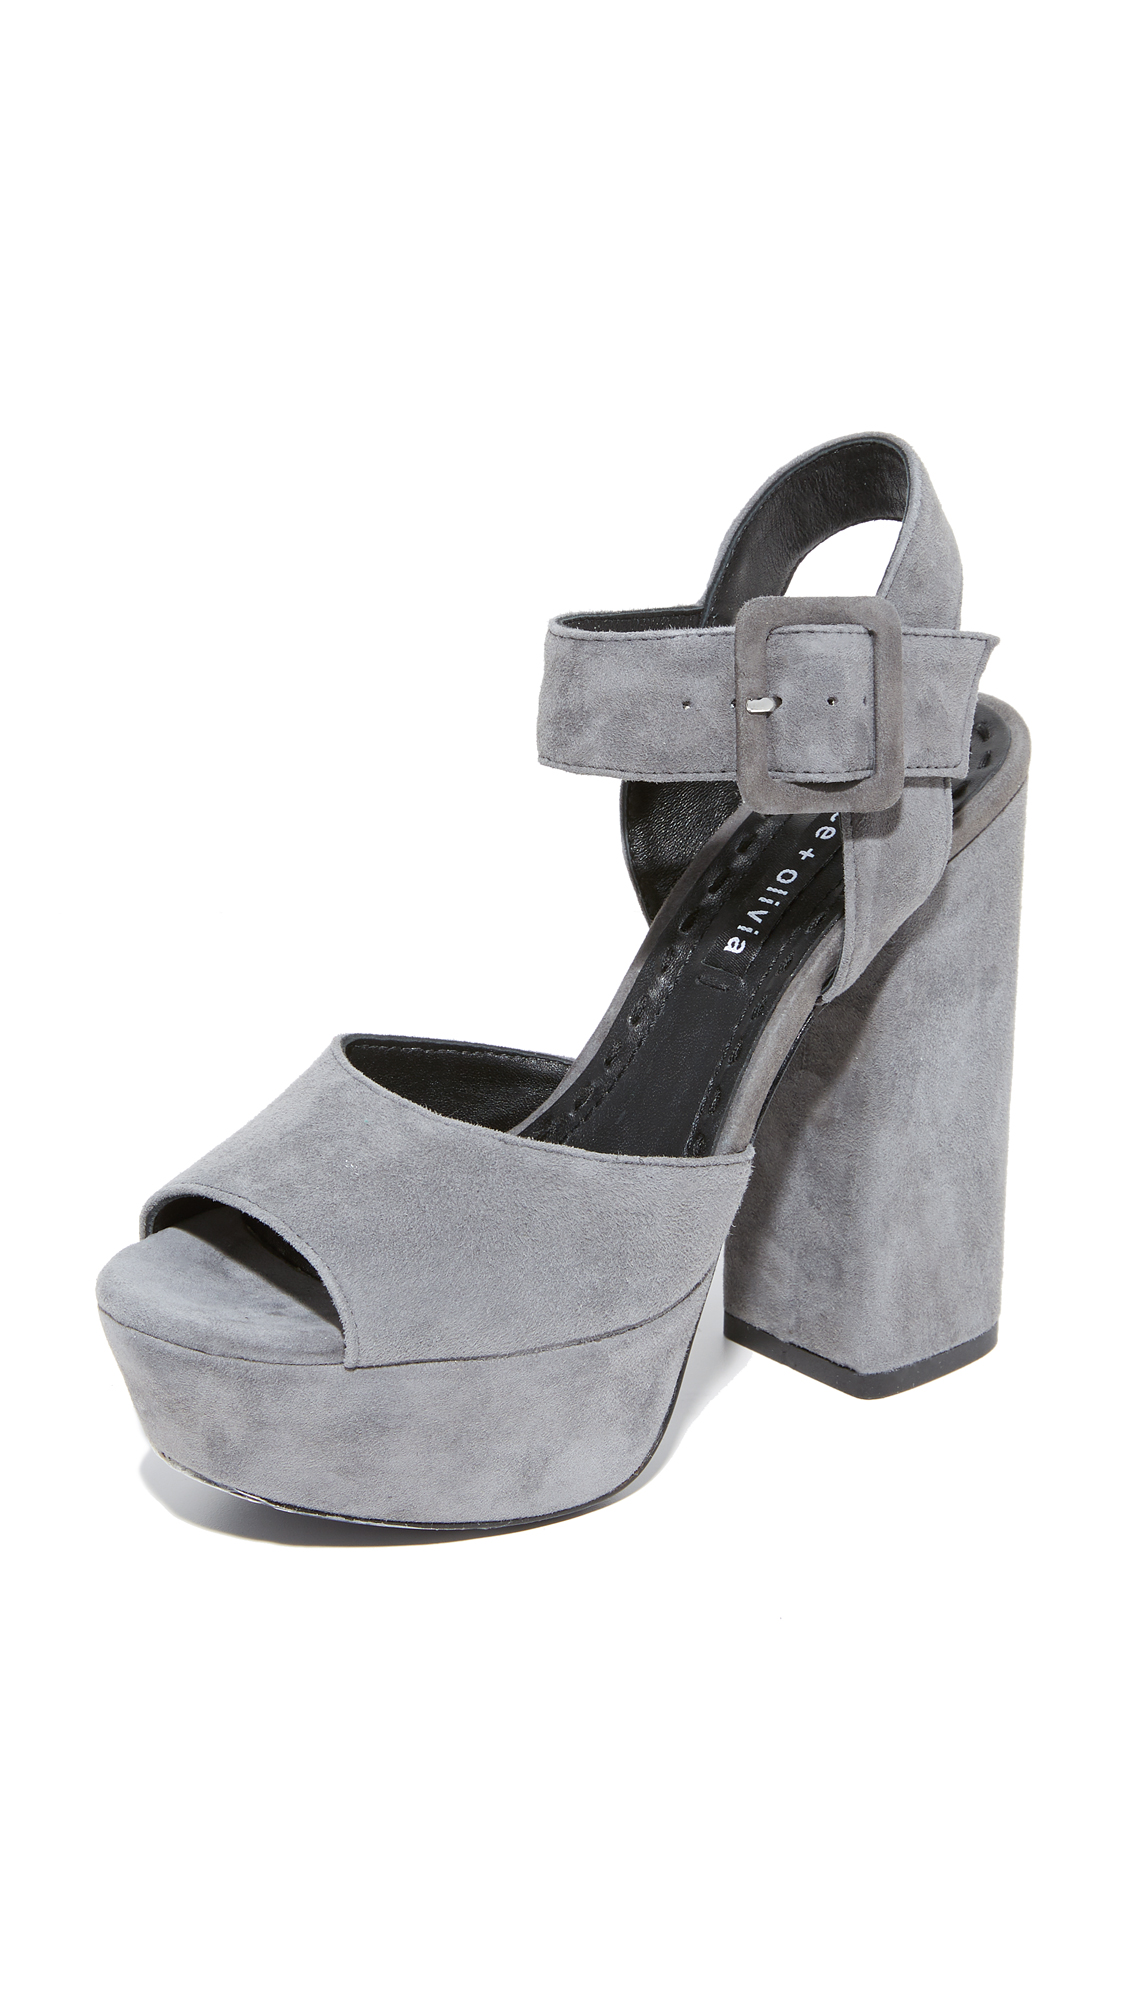 alice + olivia Lily Suede Platform Sandals - Charcoal